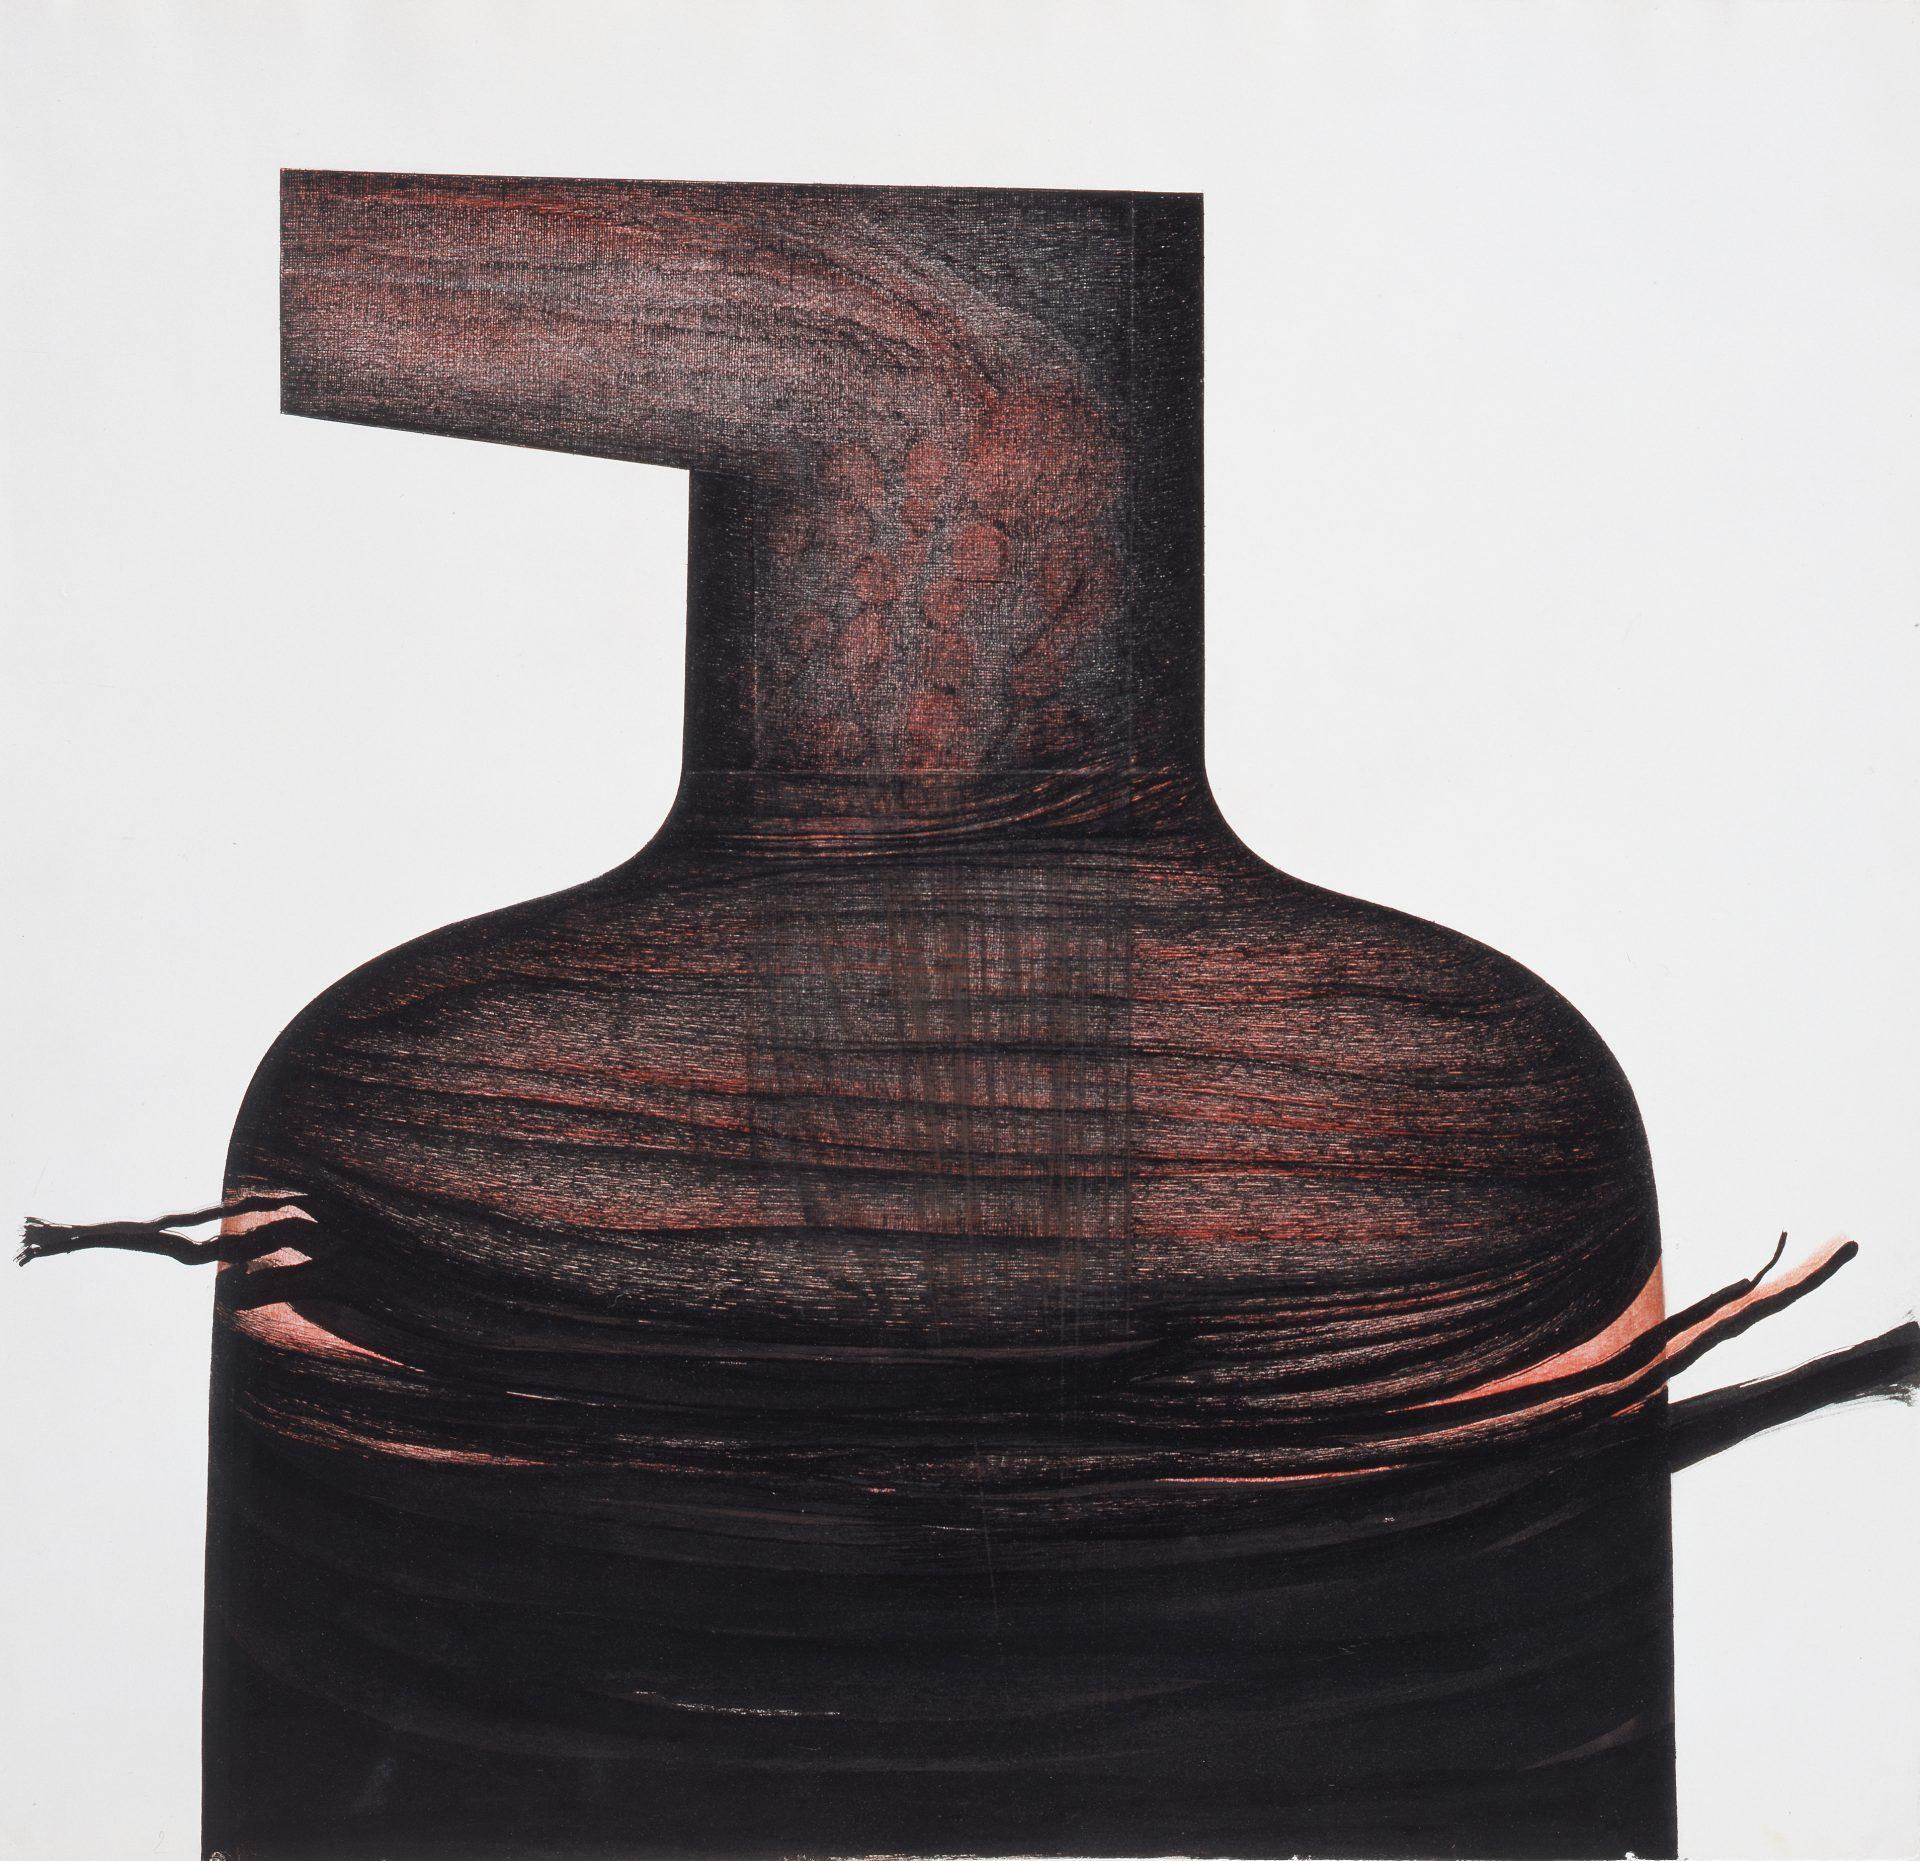 zdenka rusova grafikkens nestor sørlandets kunstmuseum henie onstad grafikk